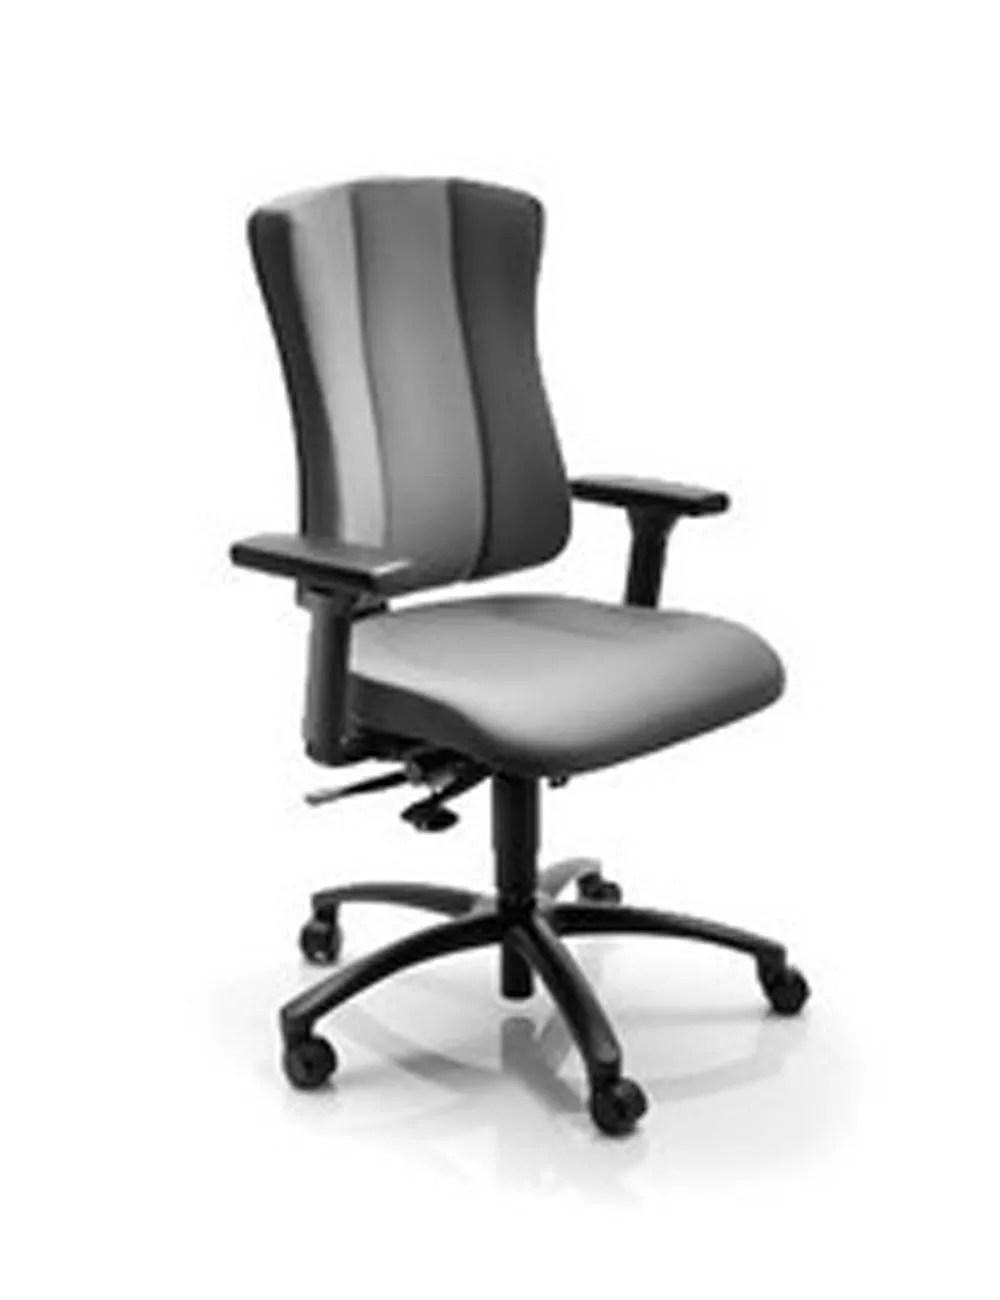 white ergonomic office chair uk cover rentals nashville hoganasmobler 501 online ergonomics